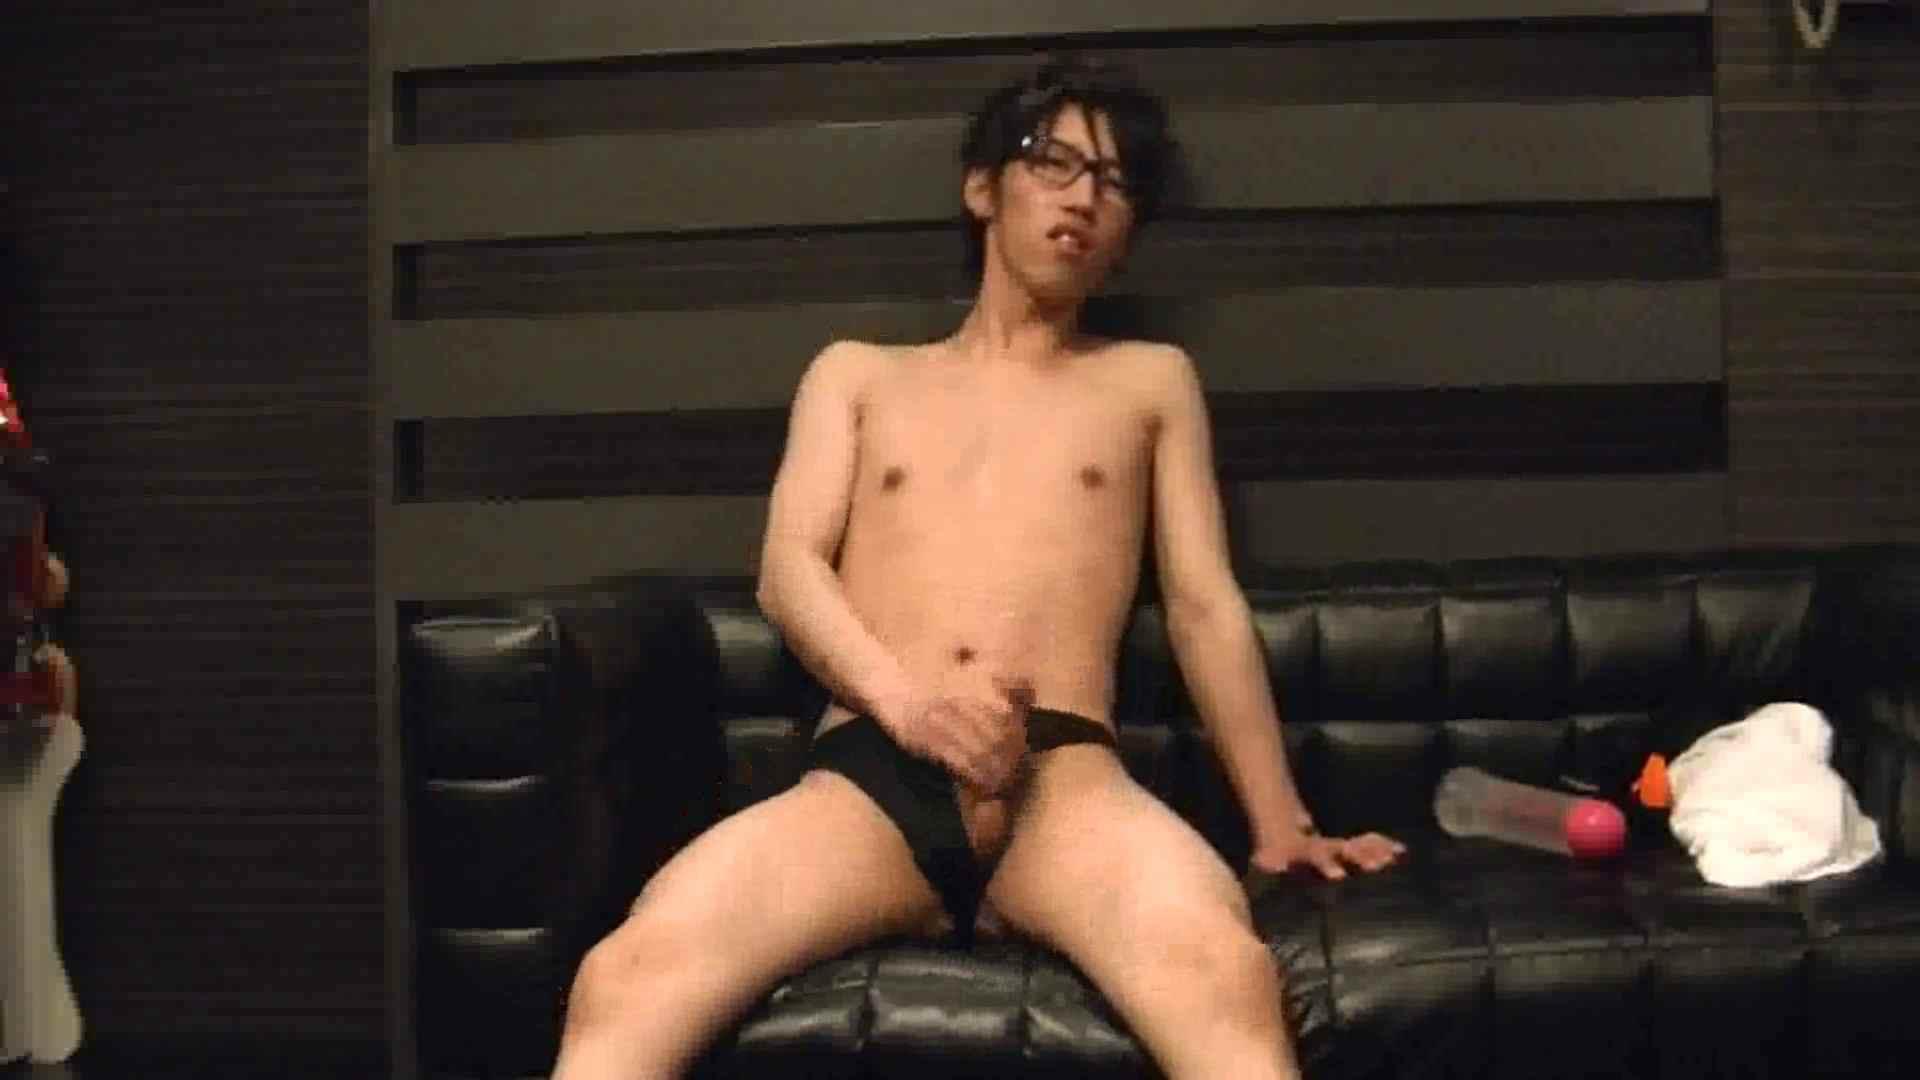 ONA見せカーニバル!! Vol3 男 ゲイ無料無修正画像 89枚 80